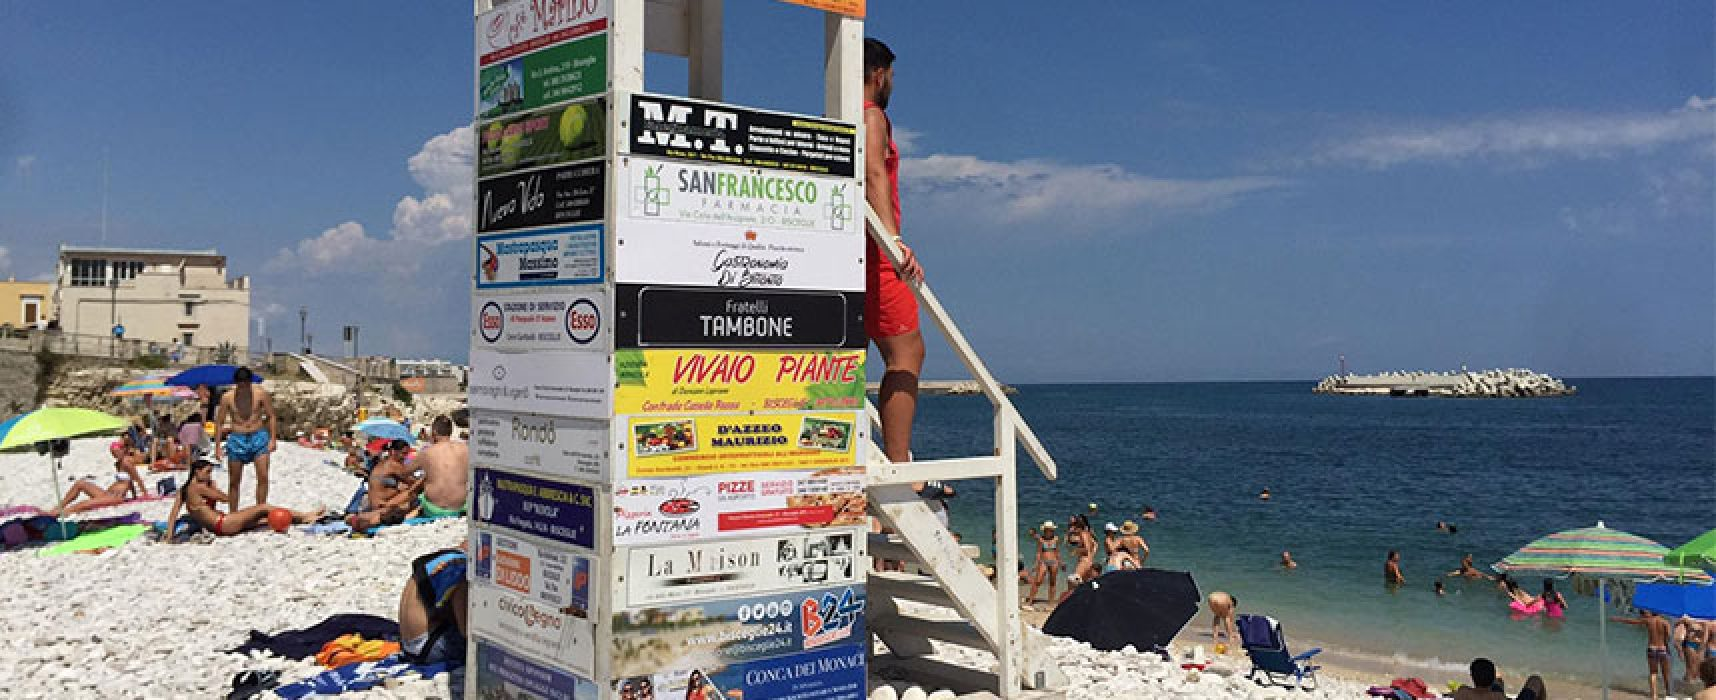 Parte Spiagge Sicure, 40 bagnini biscegliesi in servizio